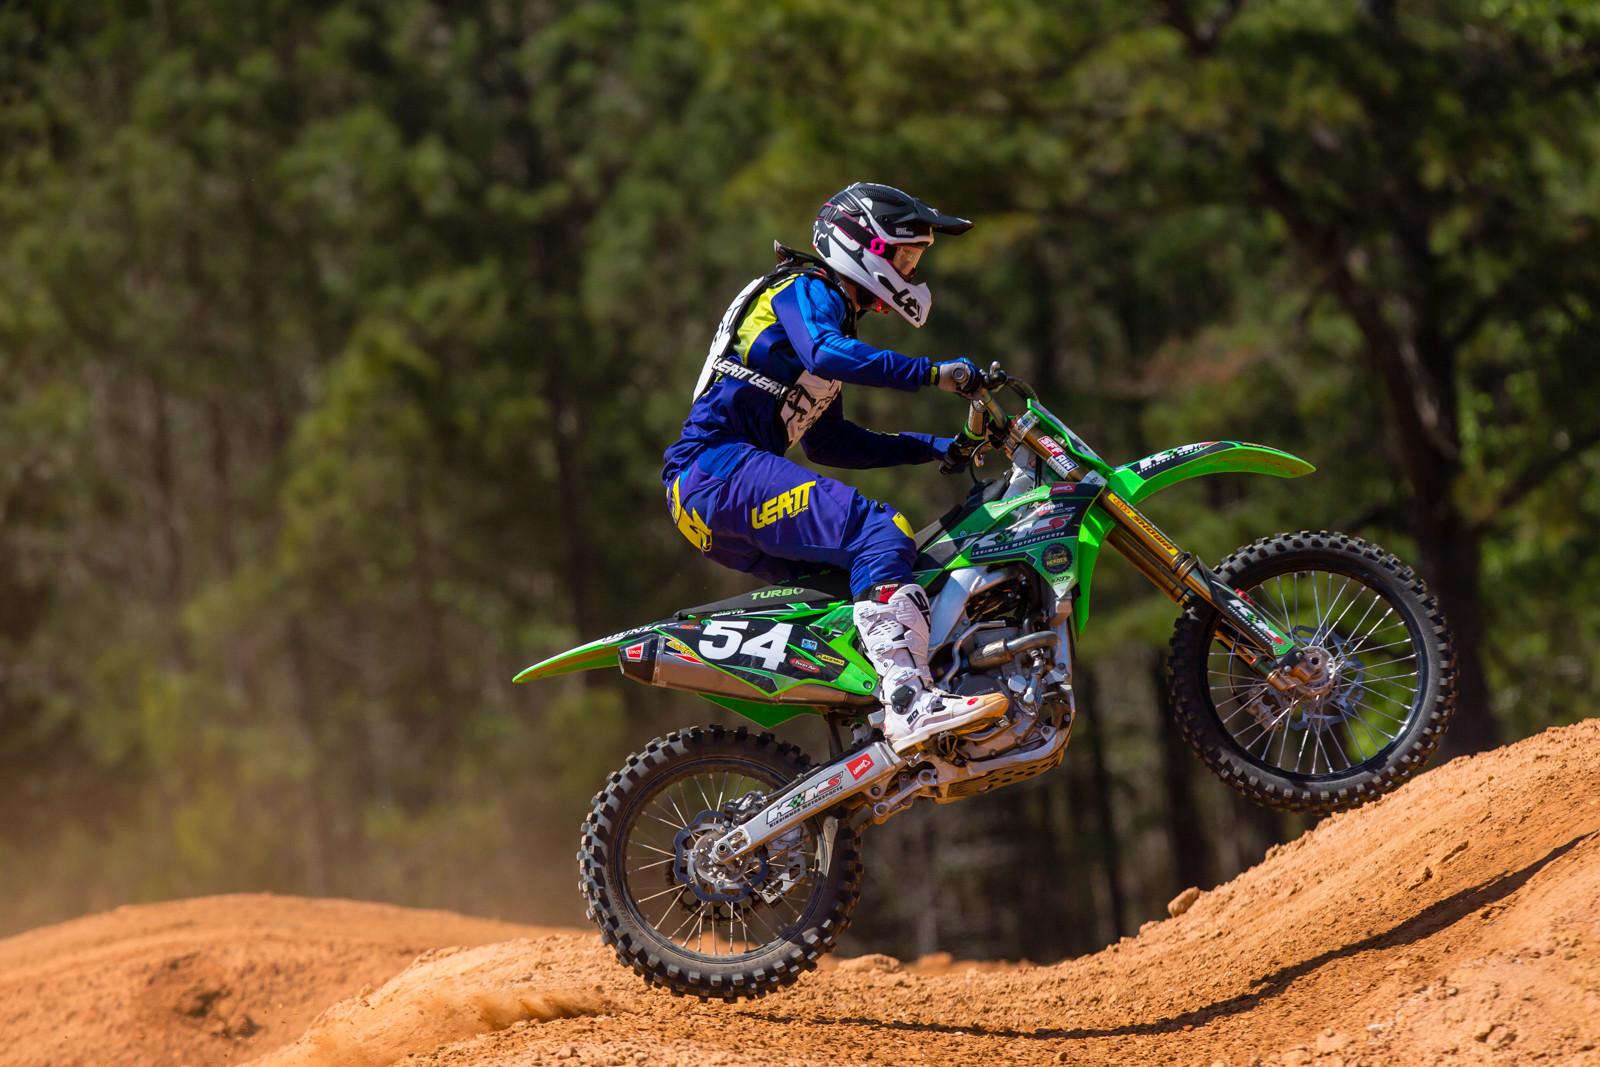 Gannon Audette - Photo Gallery: The Nest, Goat Farm, and MTF - Motocross Pictures - Vital MX